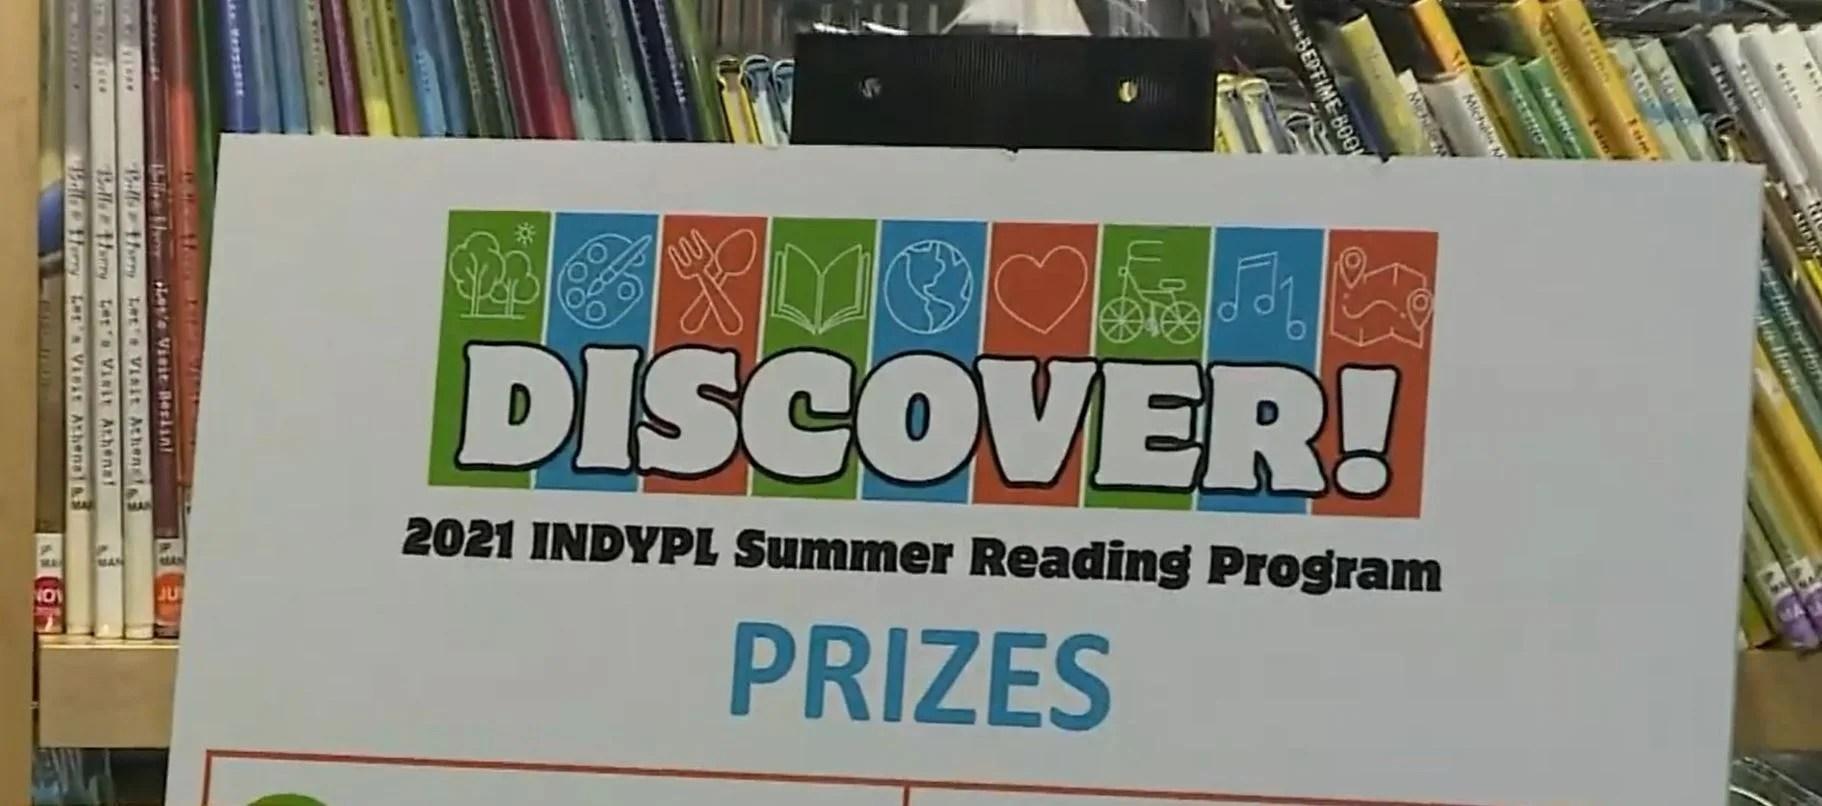 Indianapolis Public Library kicks off summer reading program - WISH-TV